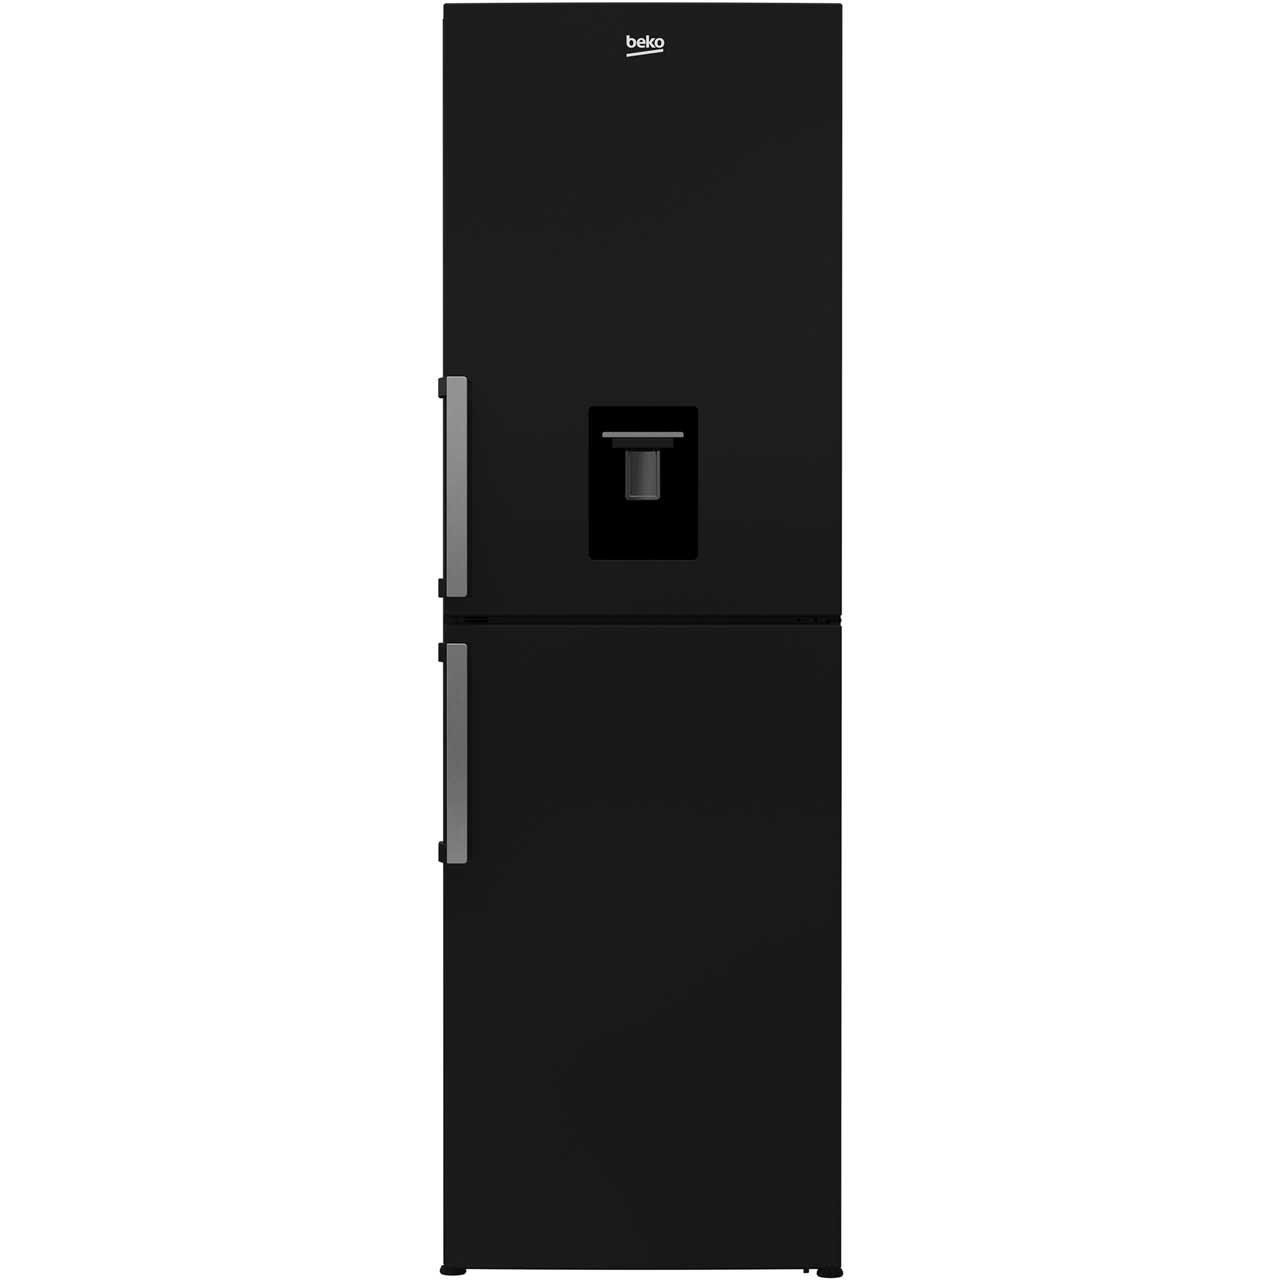 Beko CFP1691DB Freestanding Fridge Freezer -Black